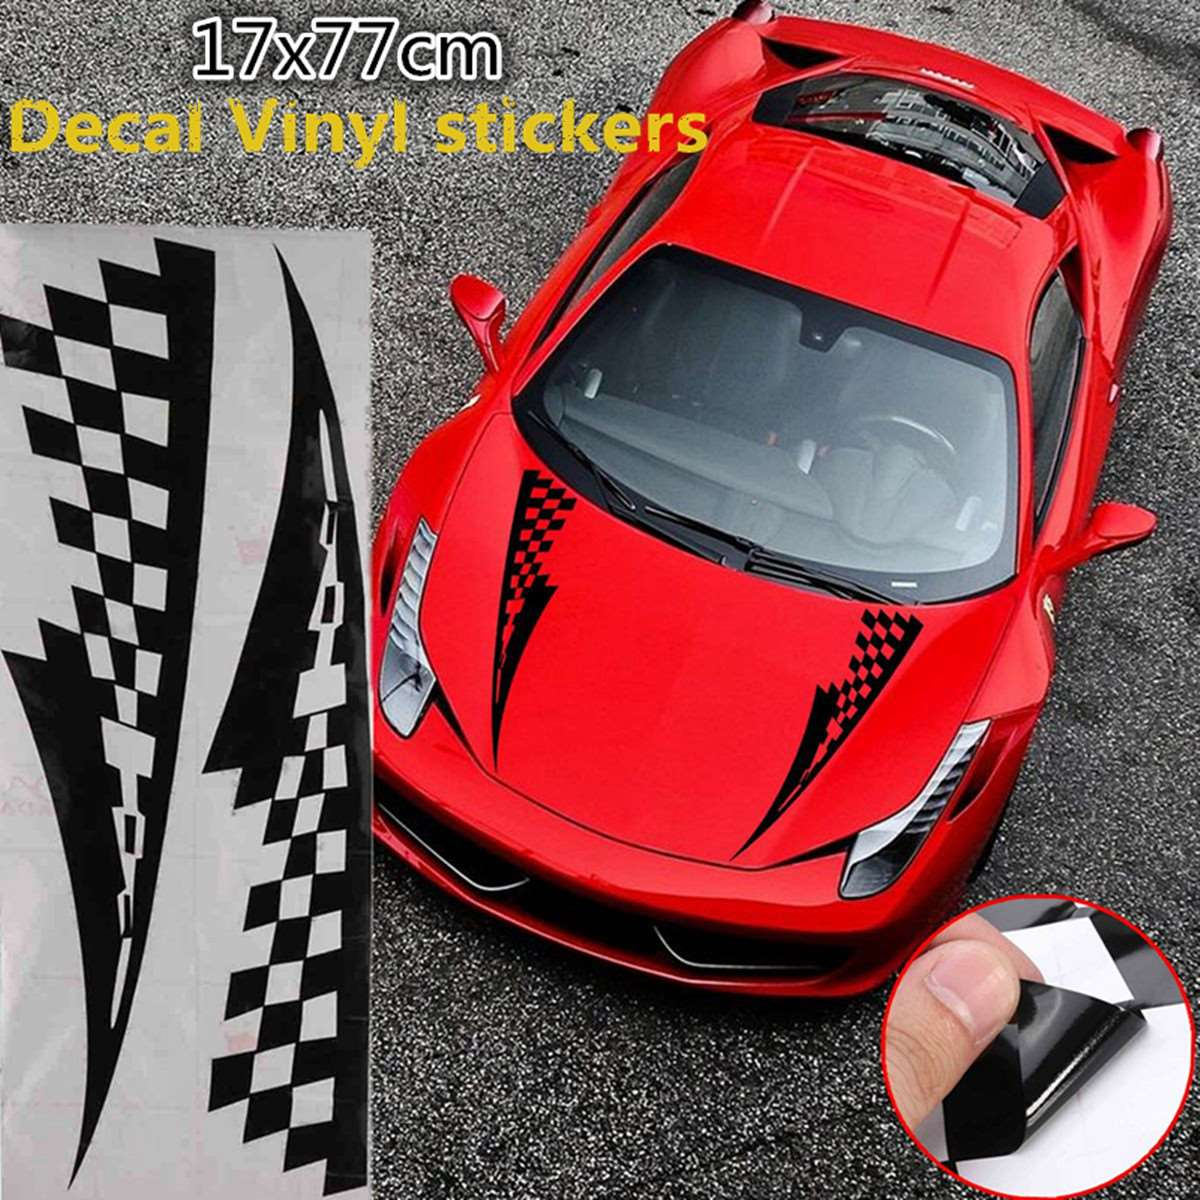 Vinyl Graphics Cars PromotionShop For Promotional Vinyl Graphics - Decal graphics for cars